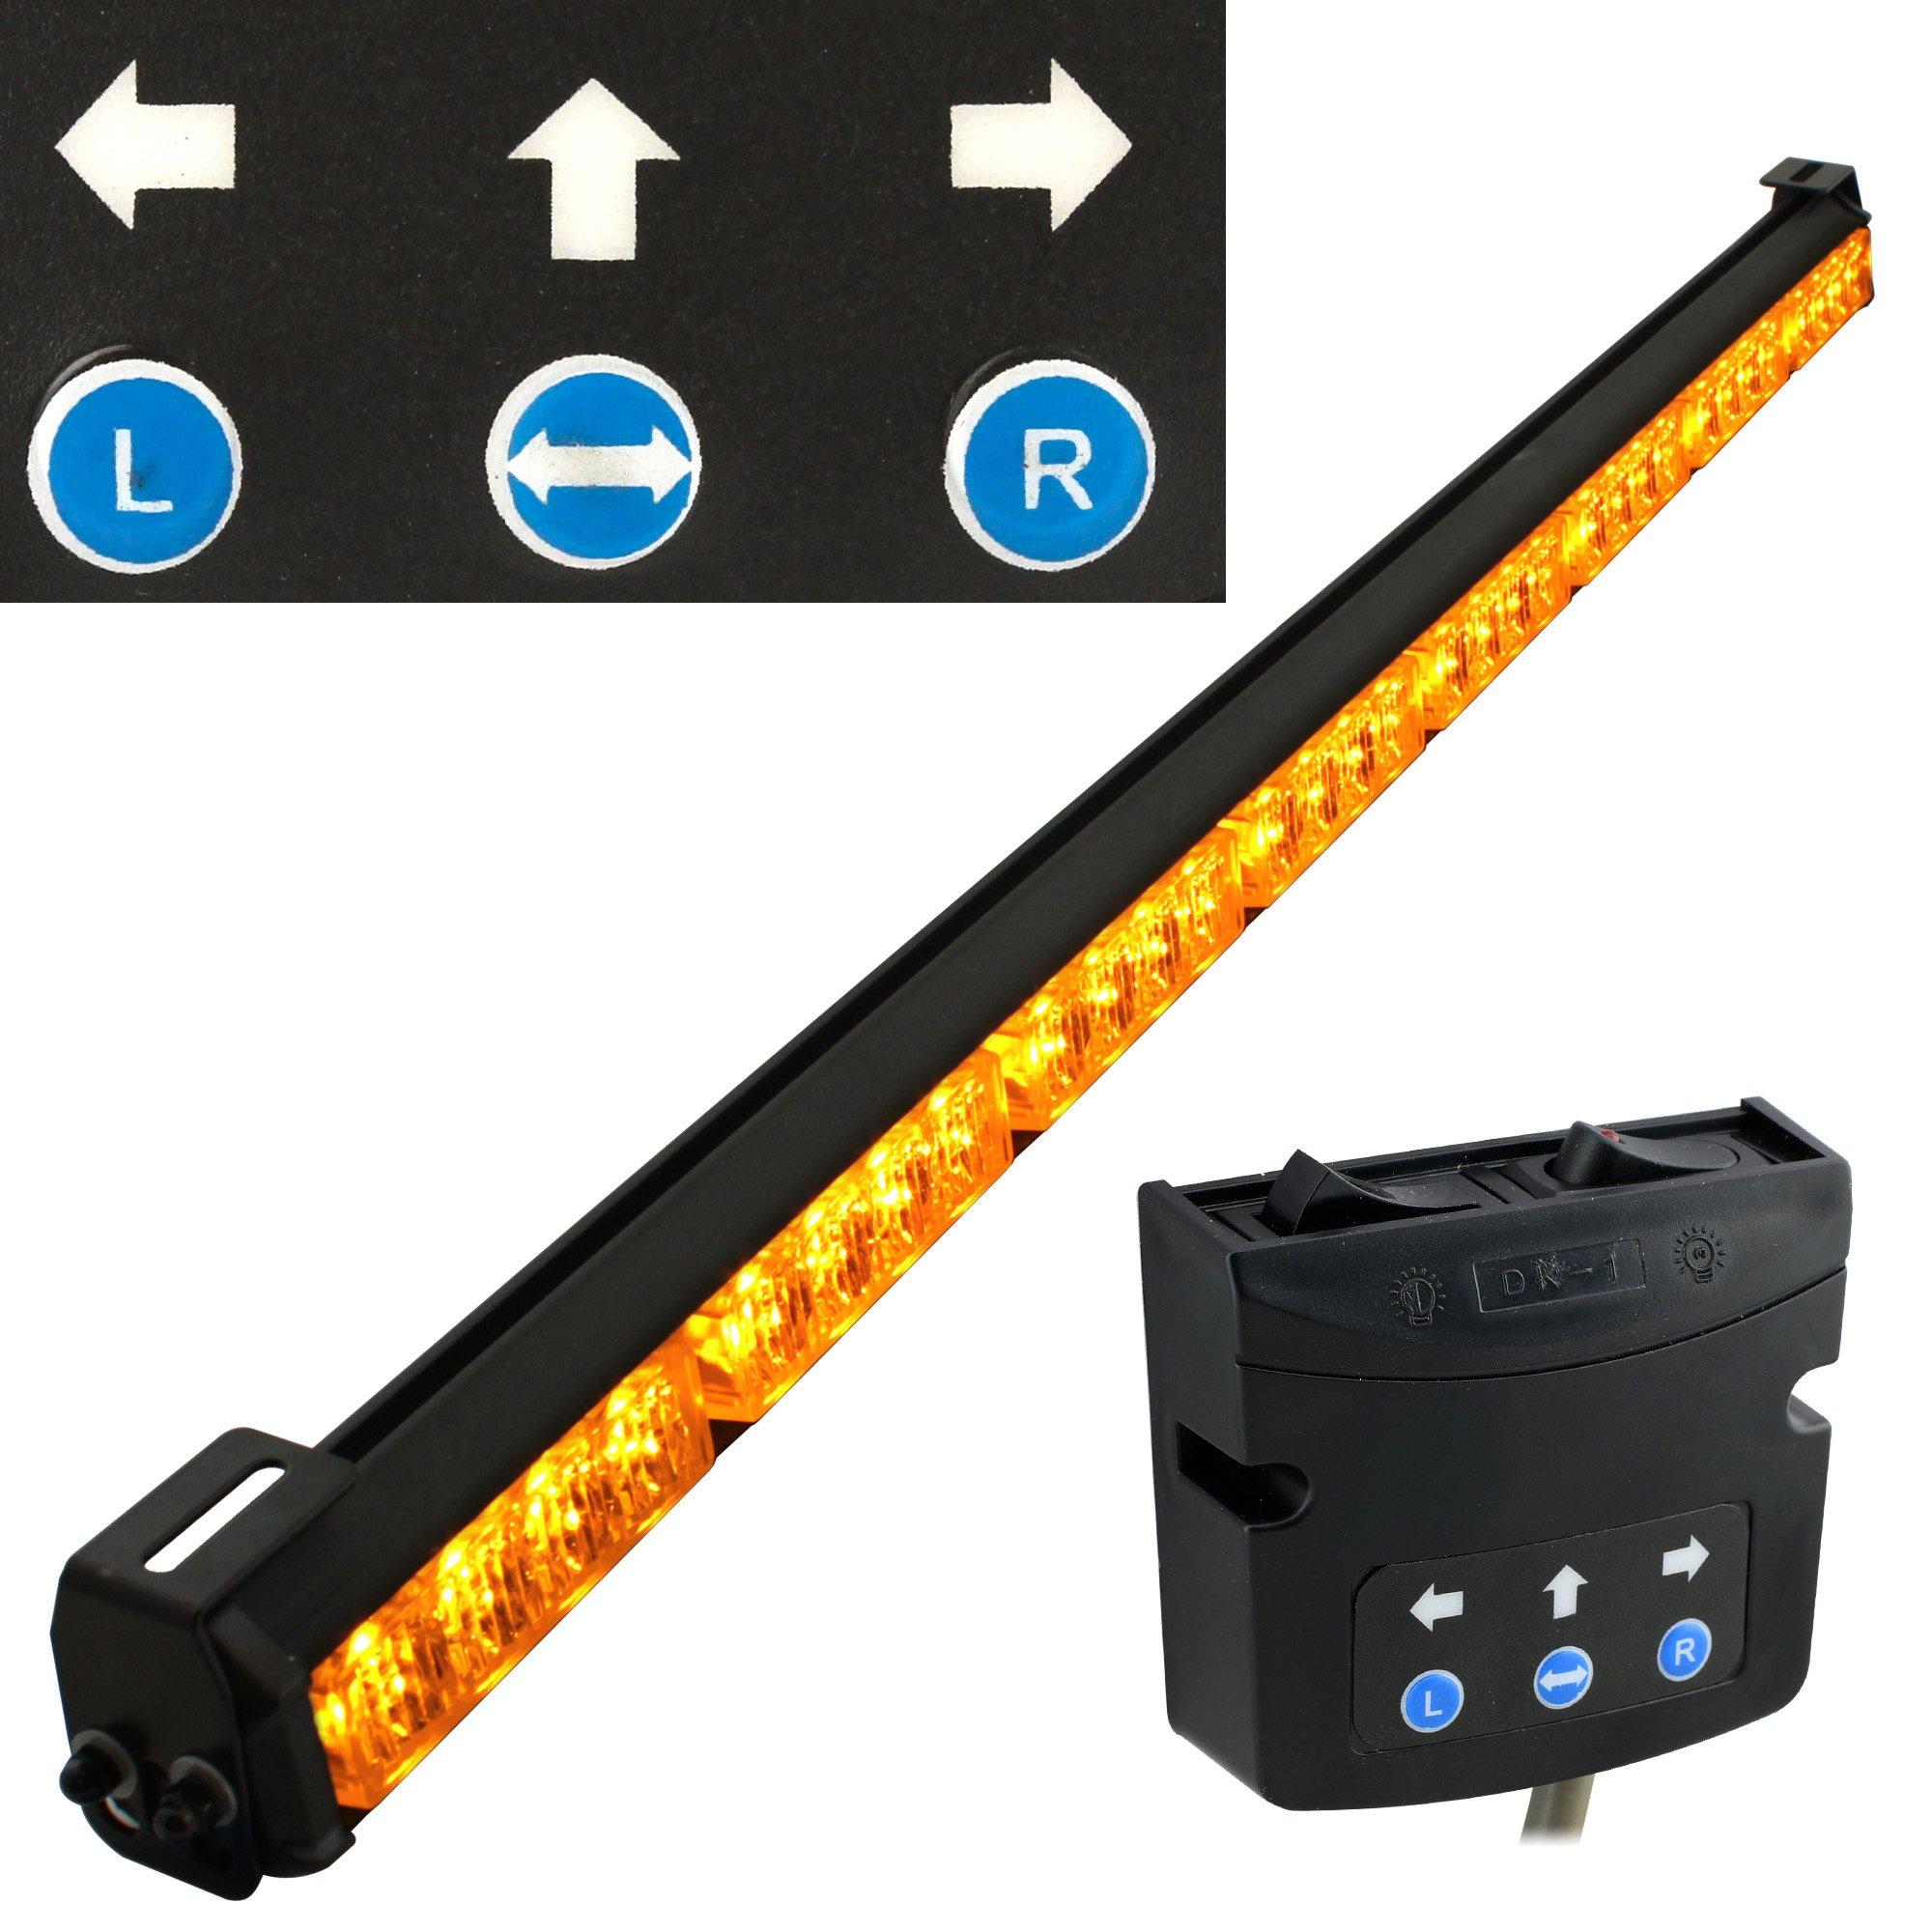 LAMPHUS SolarBlast 36'' LED Emergency Vehicle Traffic Advisor Warning Strobe Directional Light bar Available - Amber